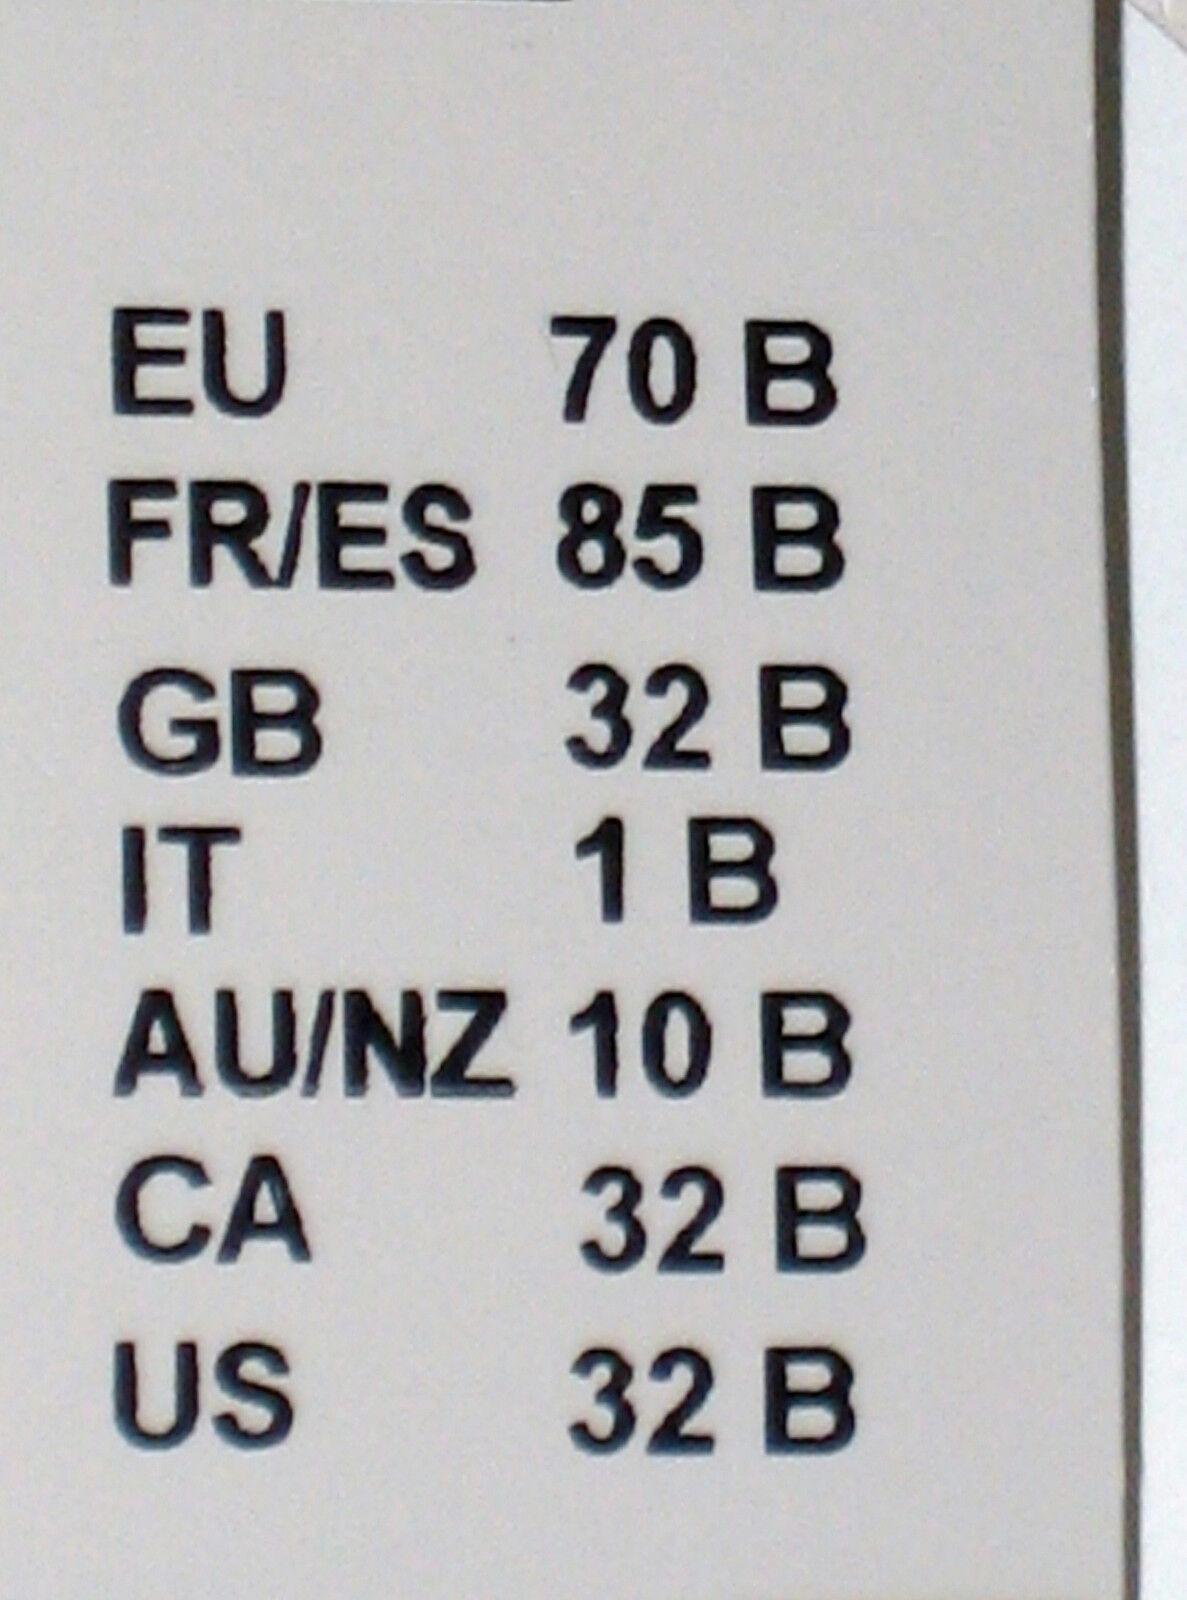 TRIUMPH BEEDEES Soutien-Gorge - 70 B - - - Beautyful JOUR WHPM ORANGE NEUF 8c07f3